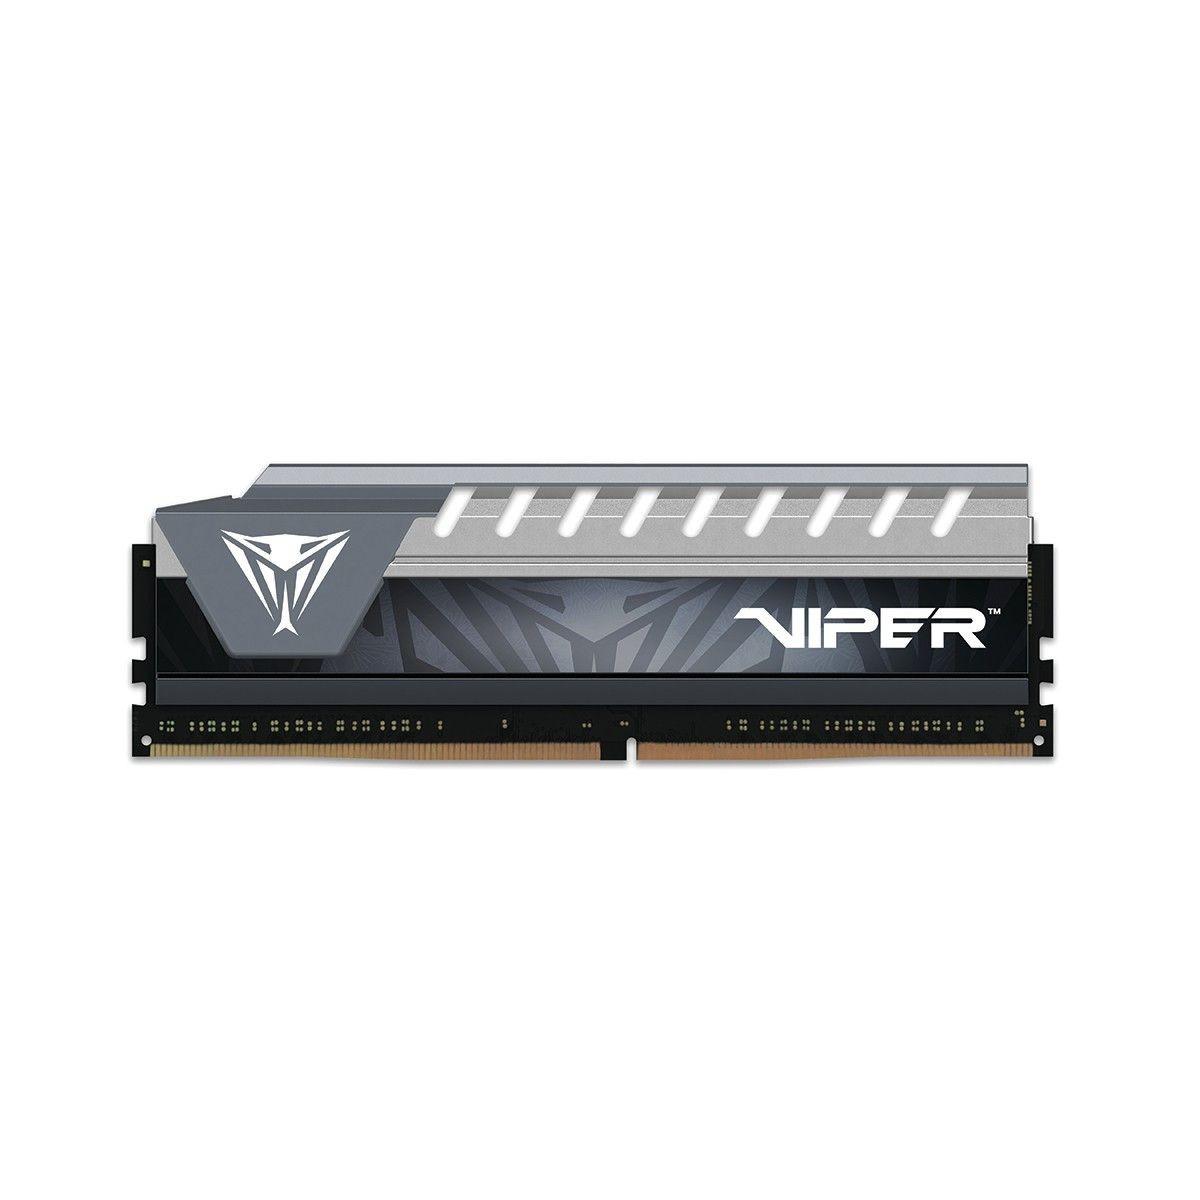 Patriot Extreme Performance Viper Elite - DDR4 - 8 GB - DIMM 288-PIN - ungepuffert